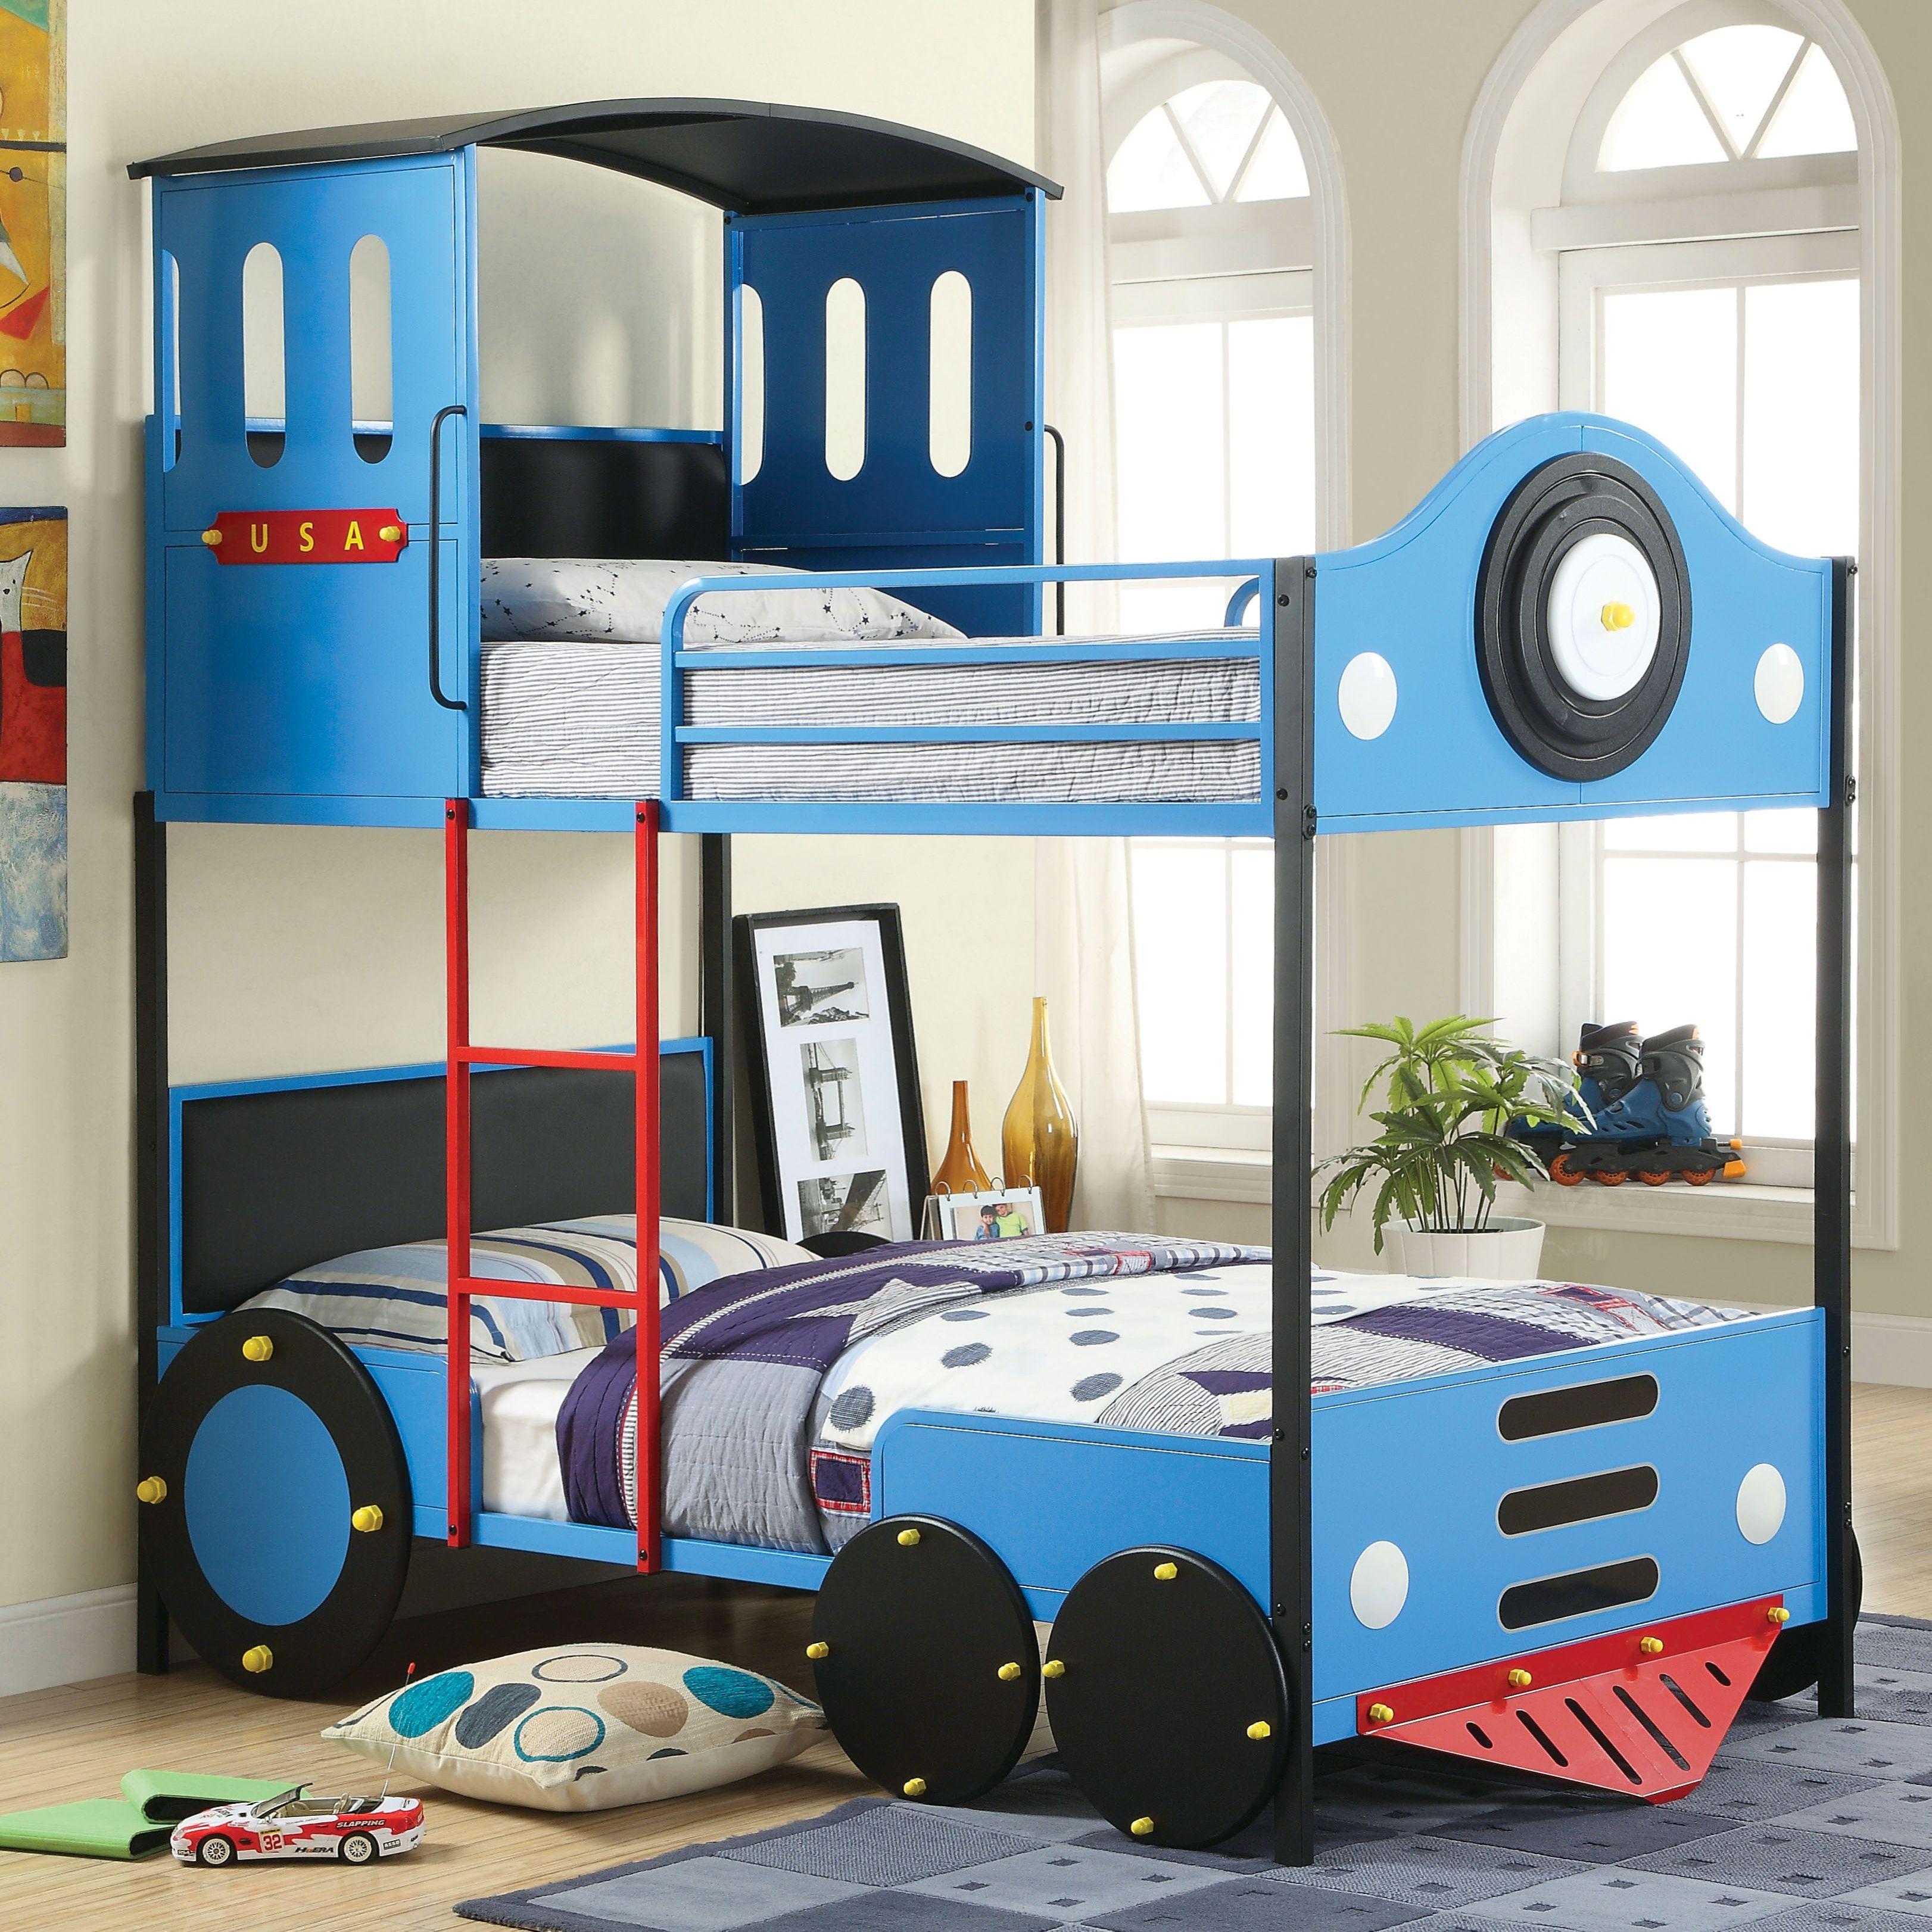 furniture of america blue train locomotive metal youth bunk bed by furniture of america - Boy Bed Frames